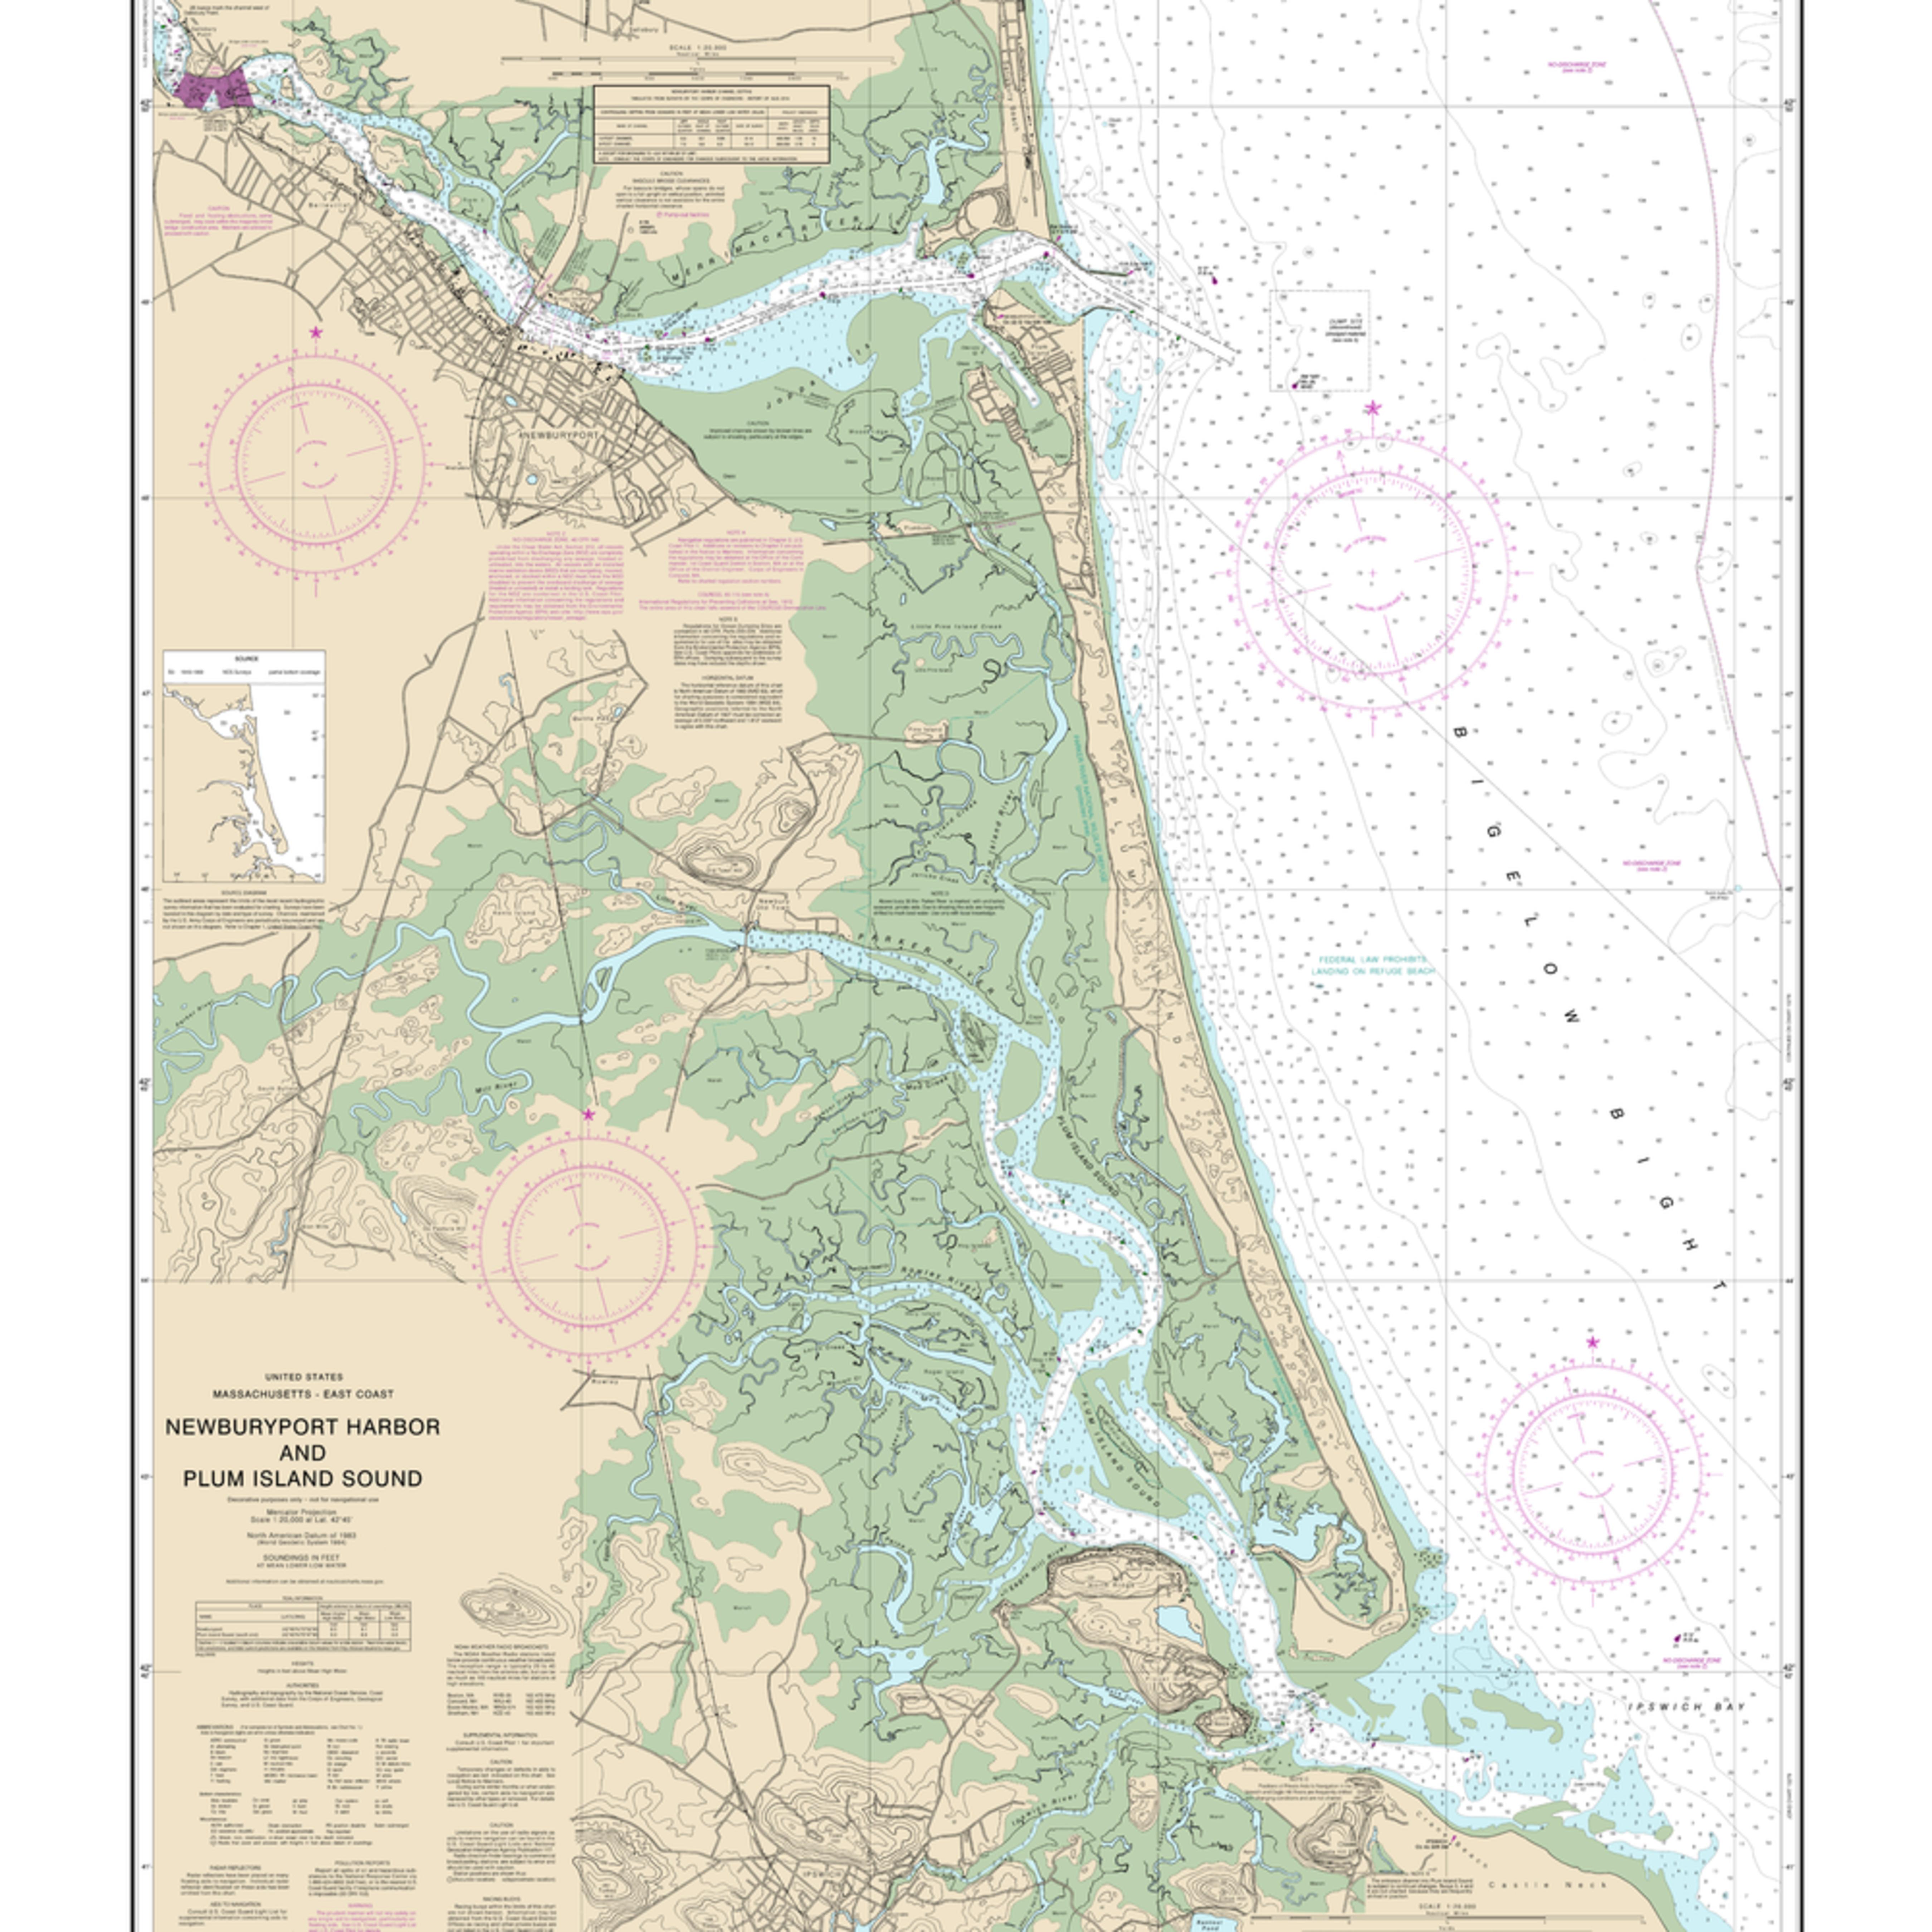 Nauticalmap 13282 newburyportharbor plumislandsound kedrzk